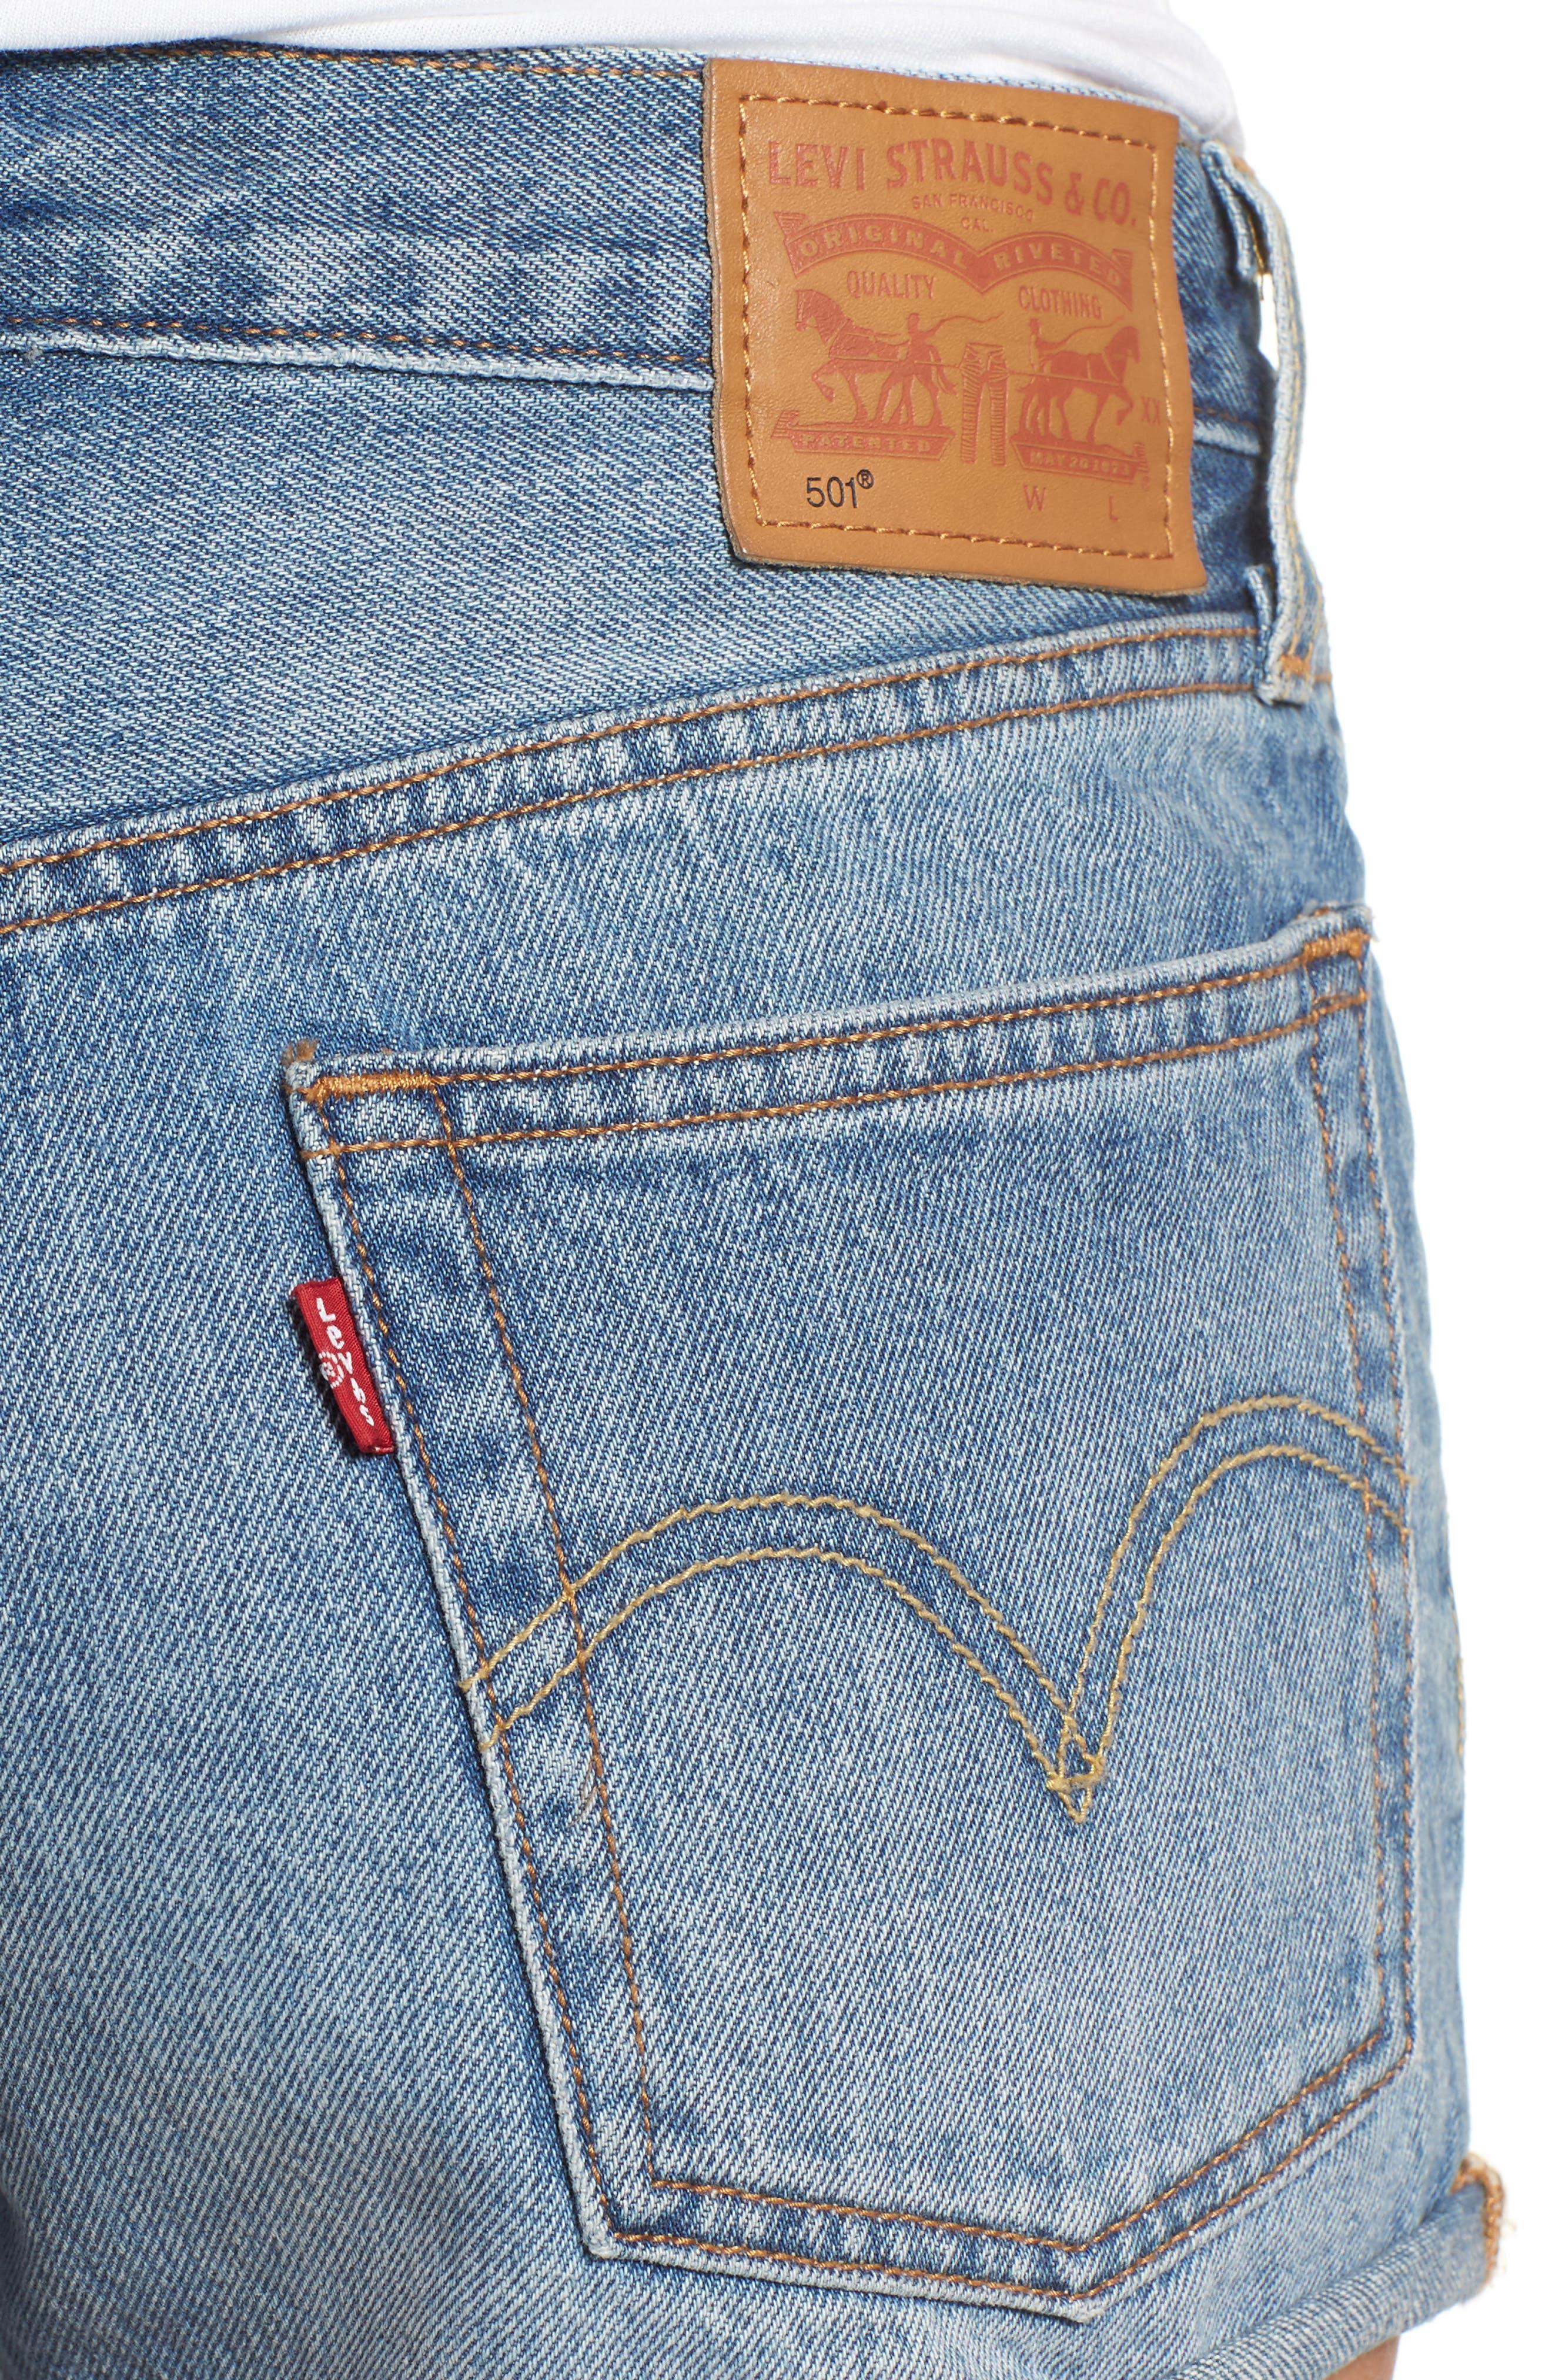 Cutoff Denim Shorts,                             Alternate thumbnail 4, color,